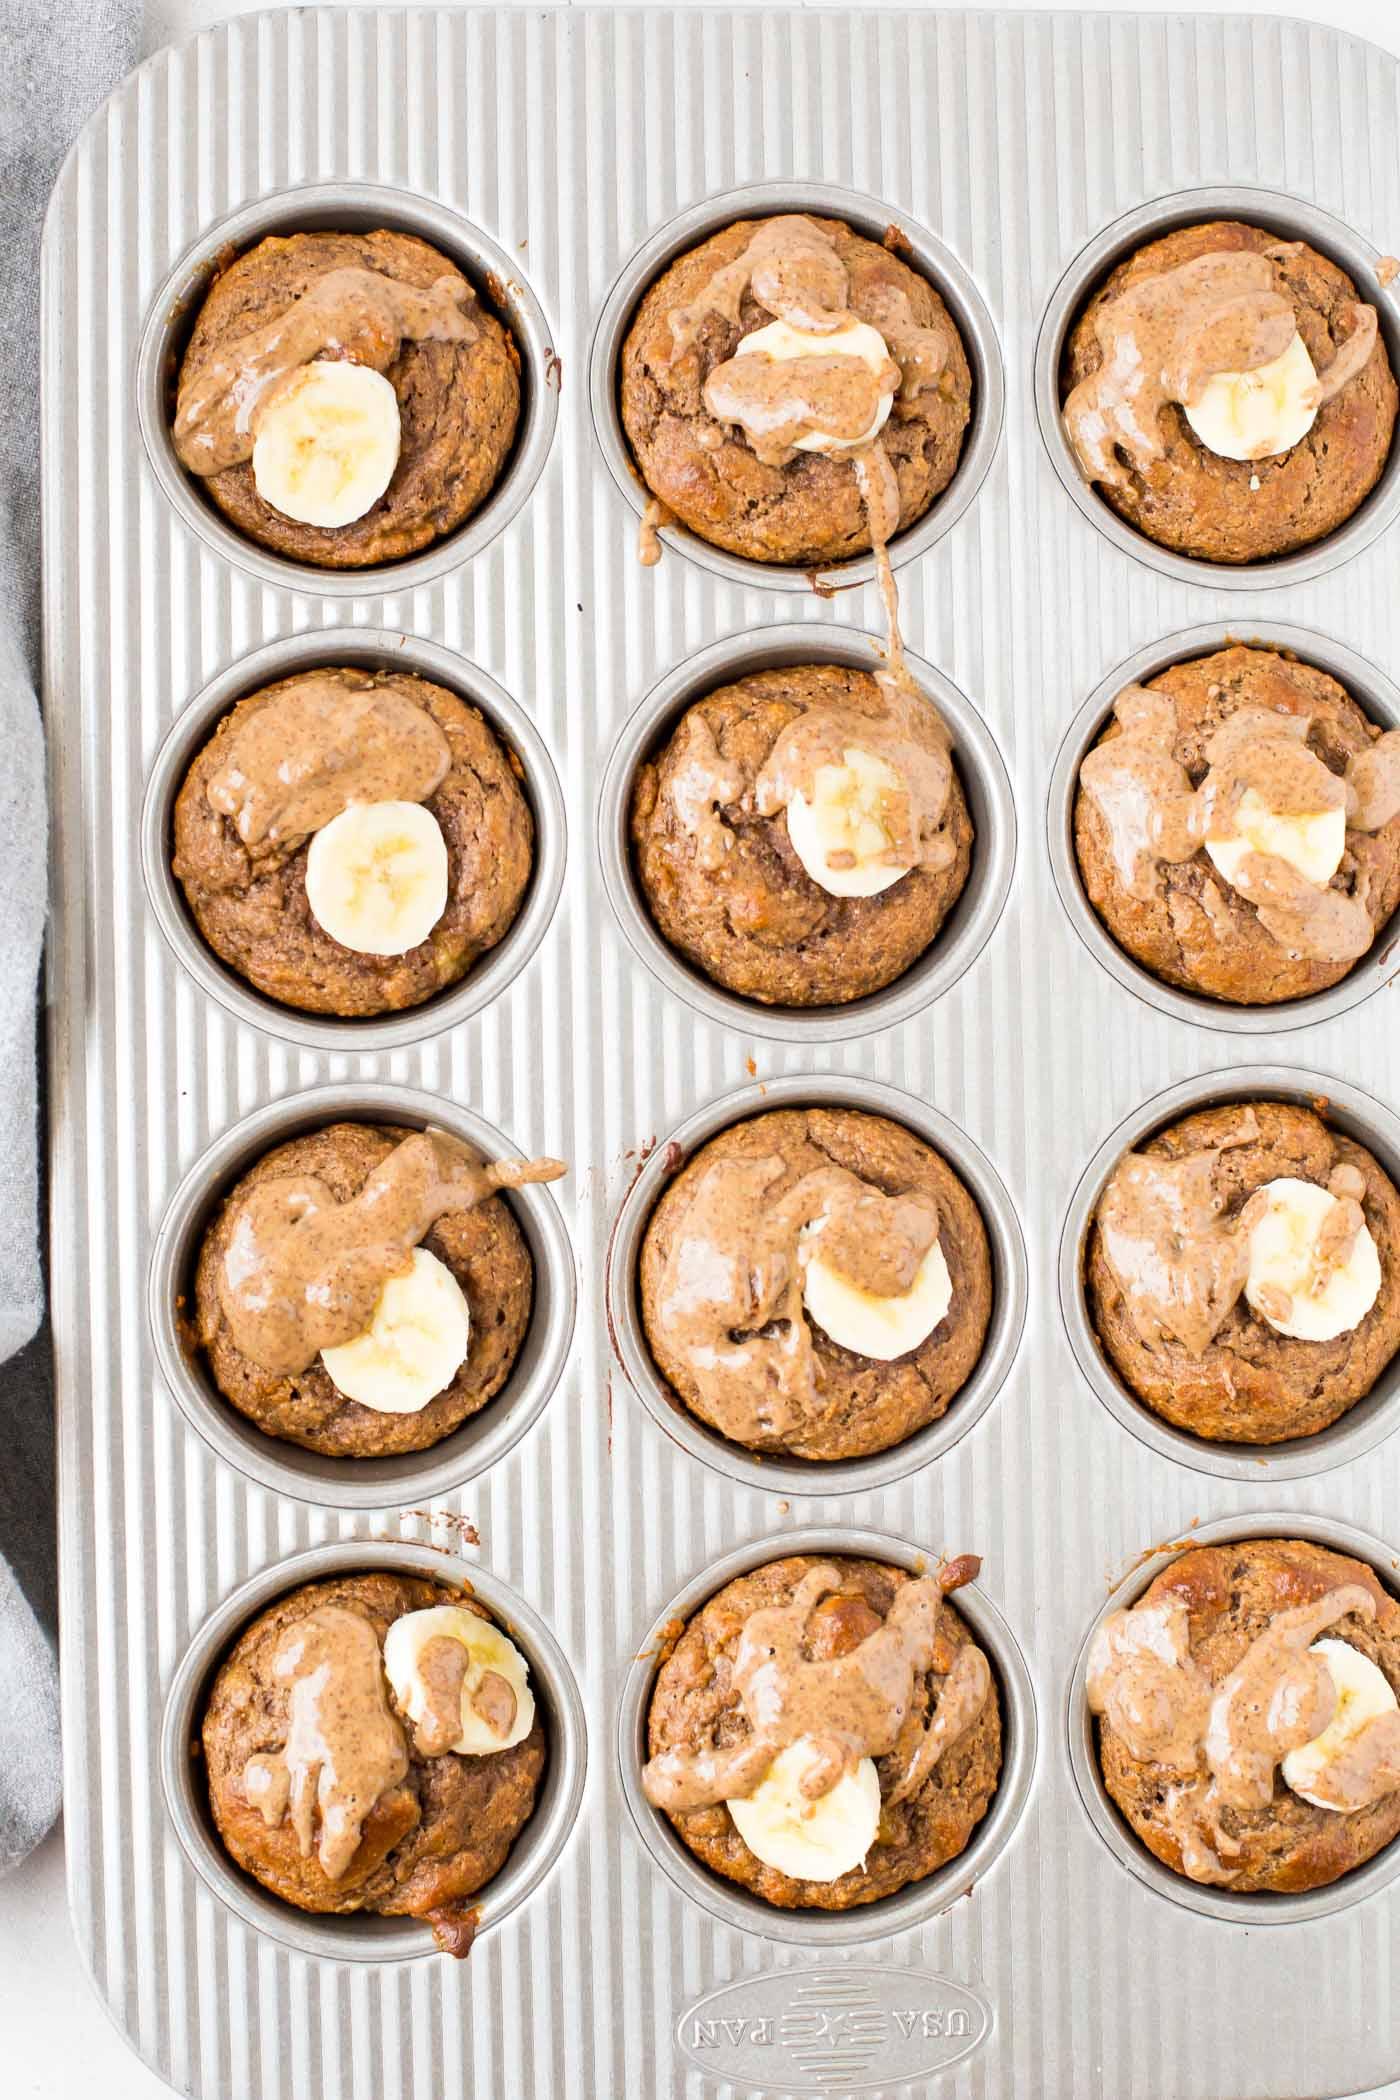 Twelve Banana Protein Powder Muffins in a muffin tin pan